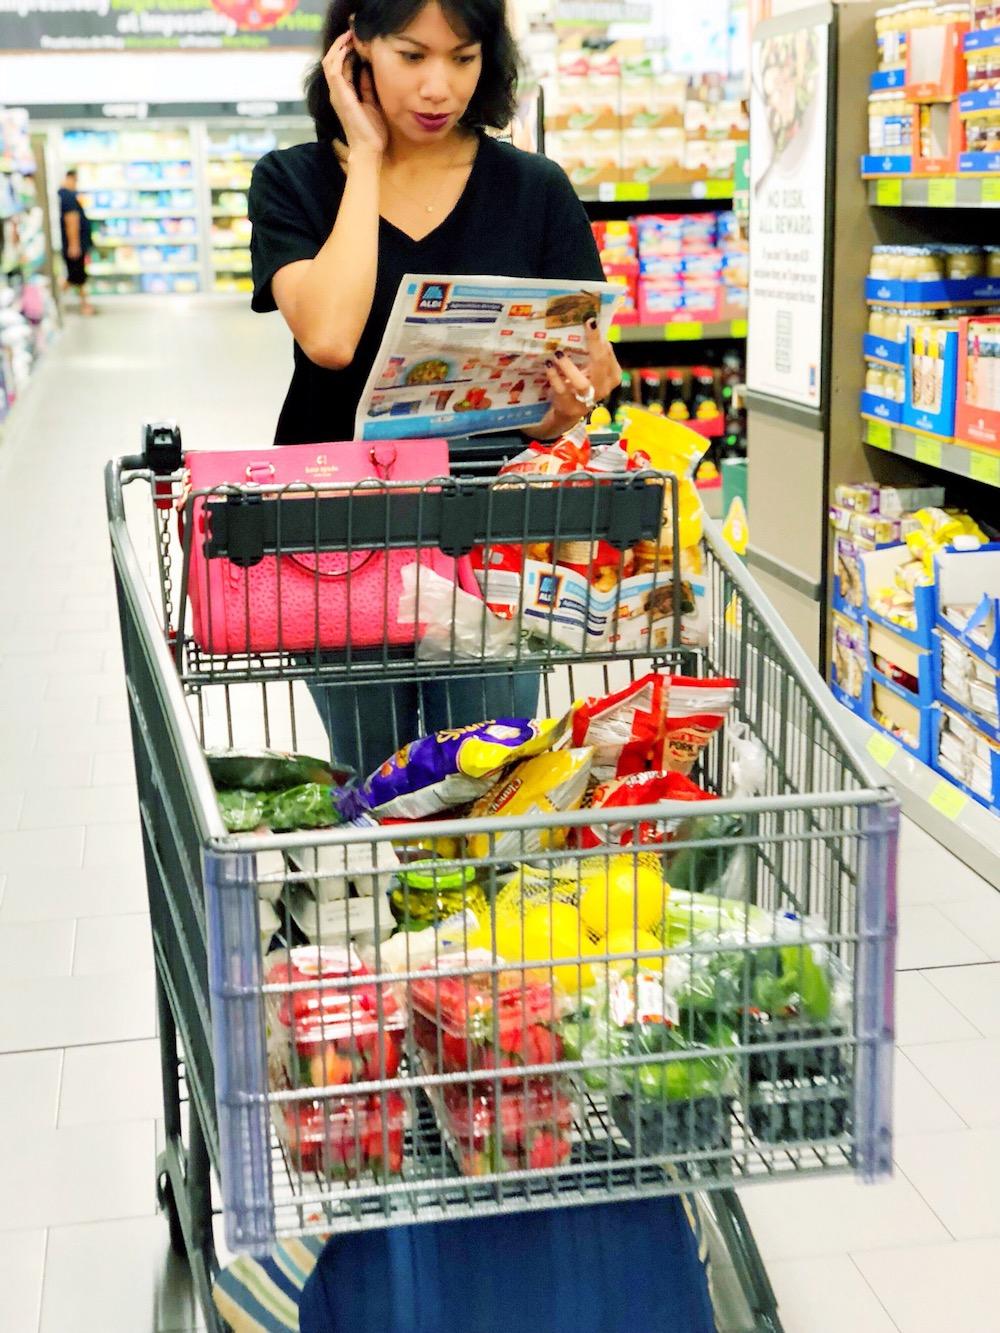 ALDI keto haul in grocery cart - livingmividaloca.com